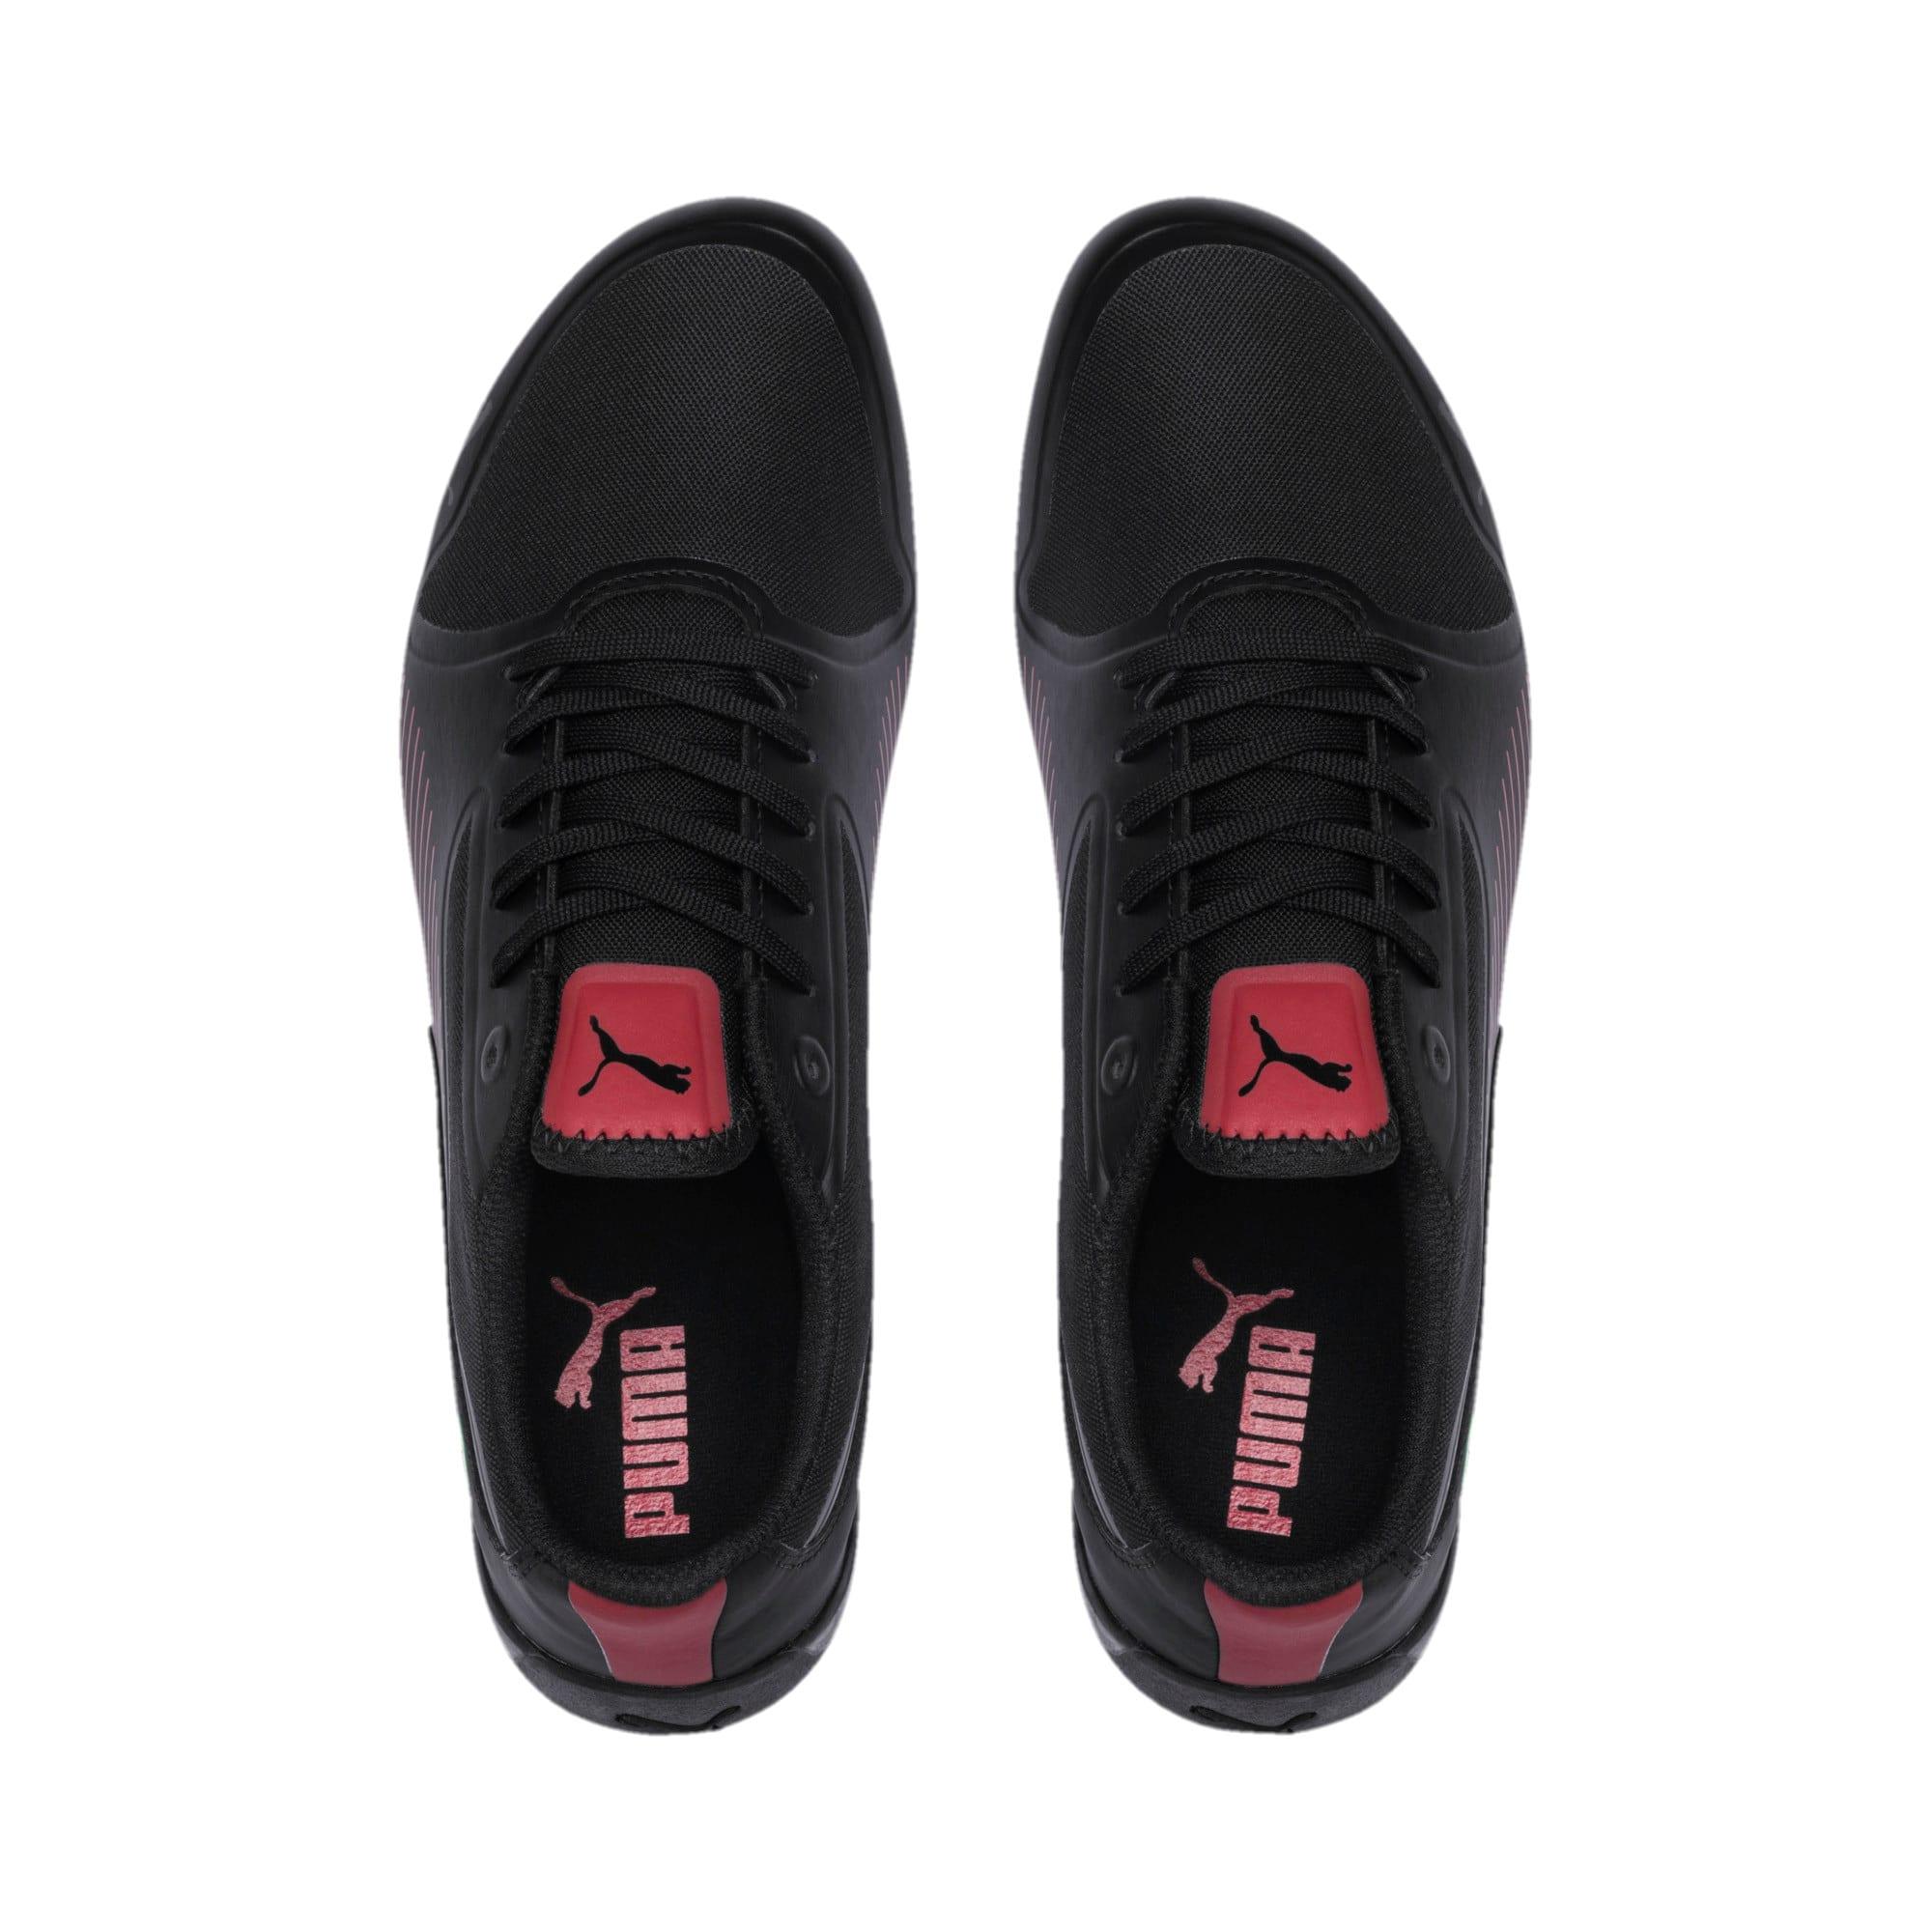 Thumbnail 6 of Scuderia Ferrari Drift Cat 7 Ultra Shoes, Puma Black-Rosso Corsa, medium